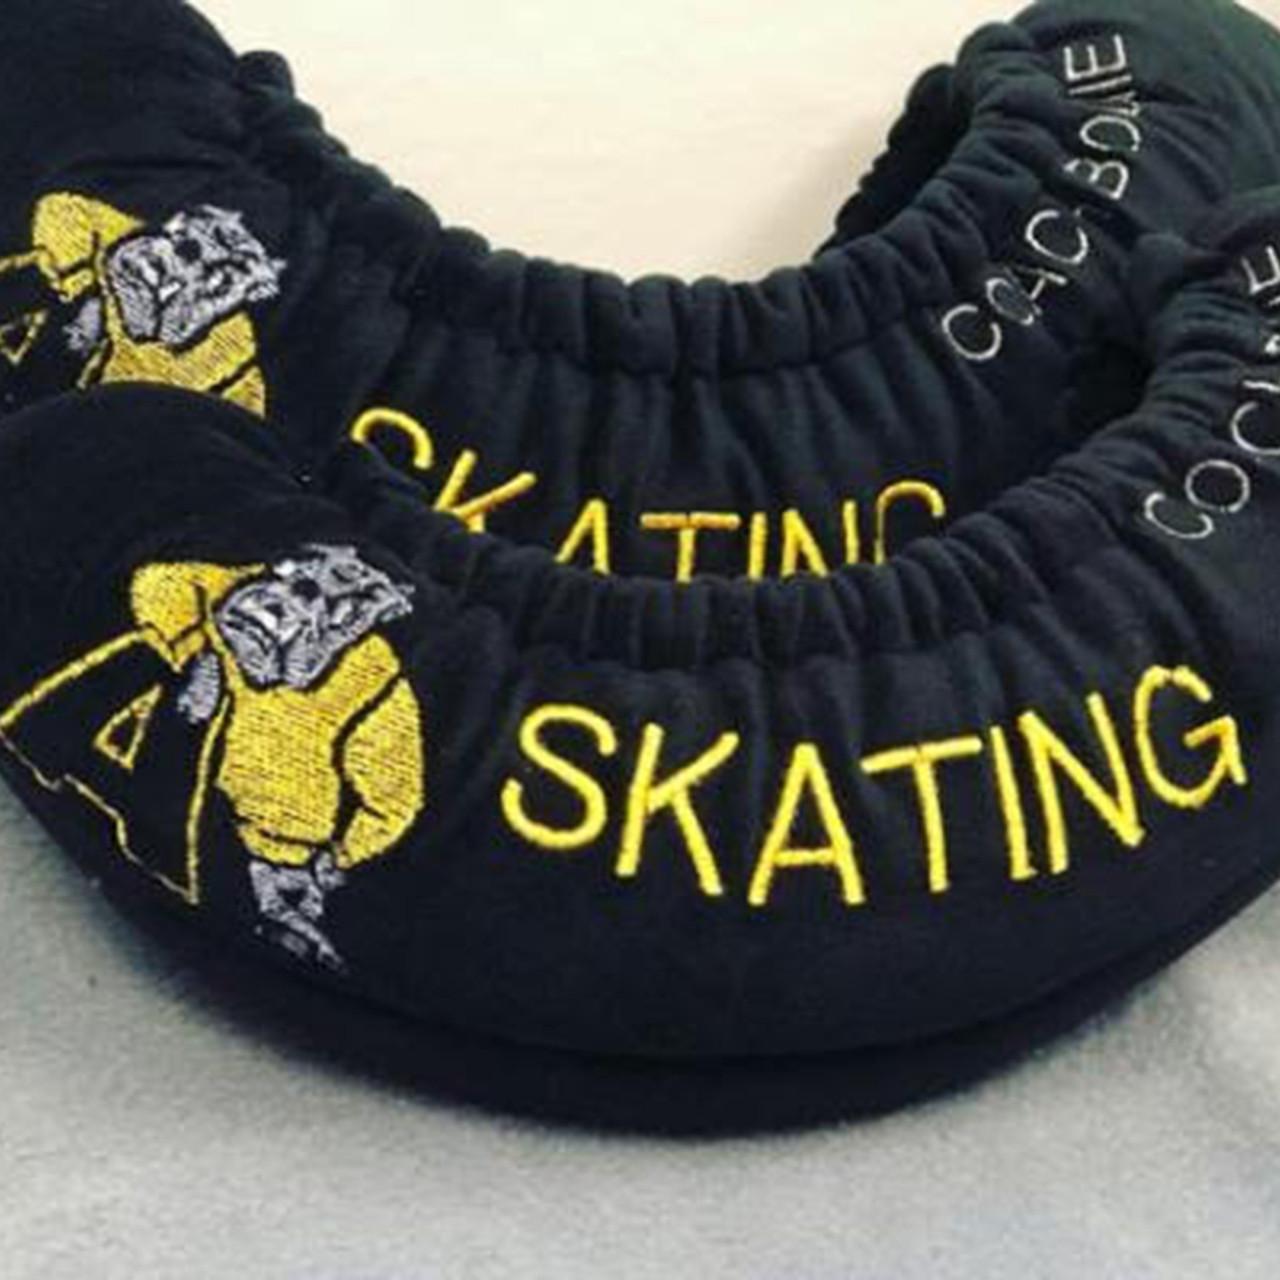 Adrian college - Bulldog Skating